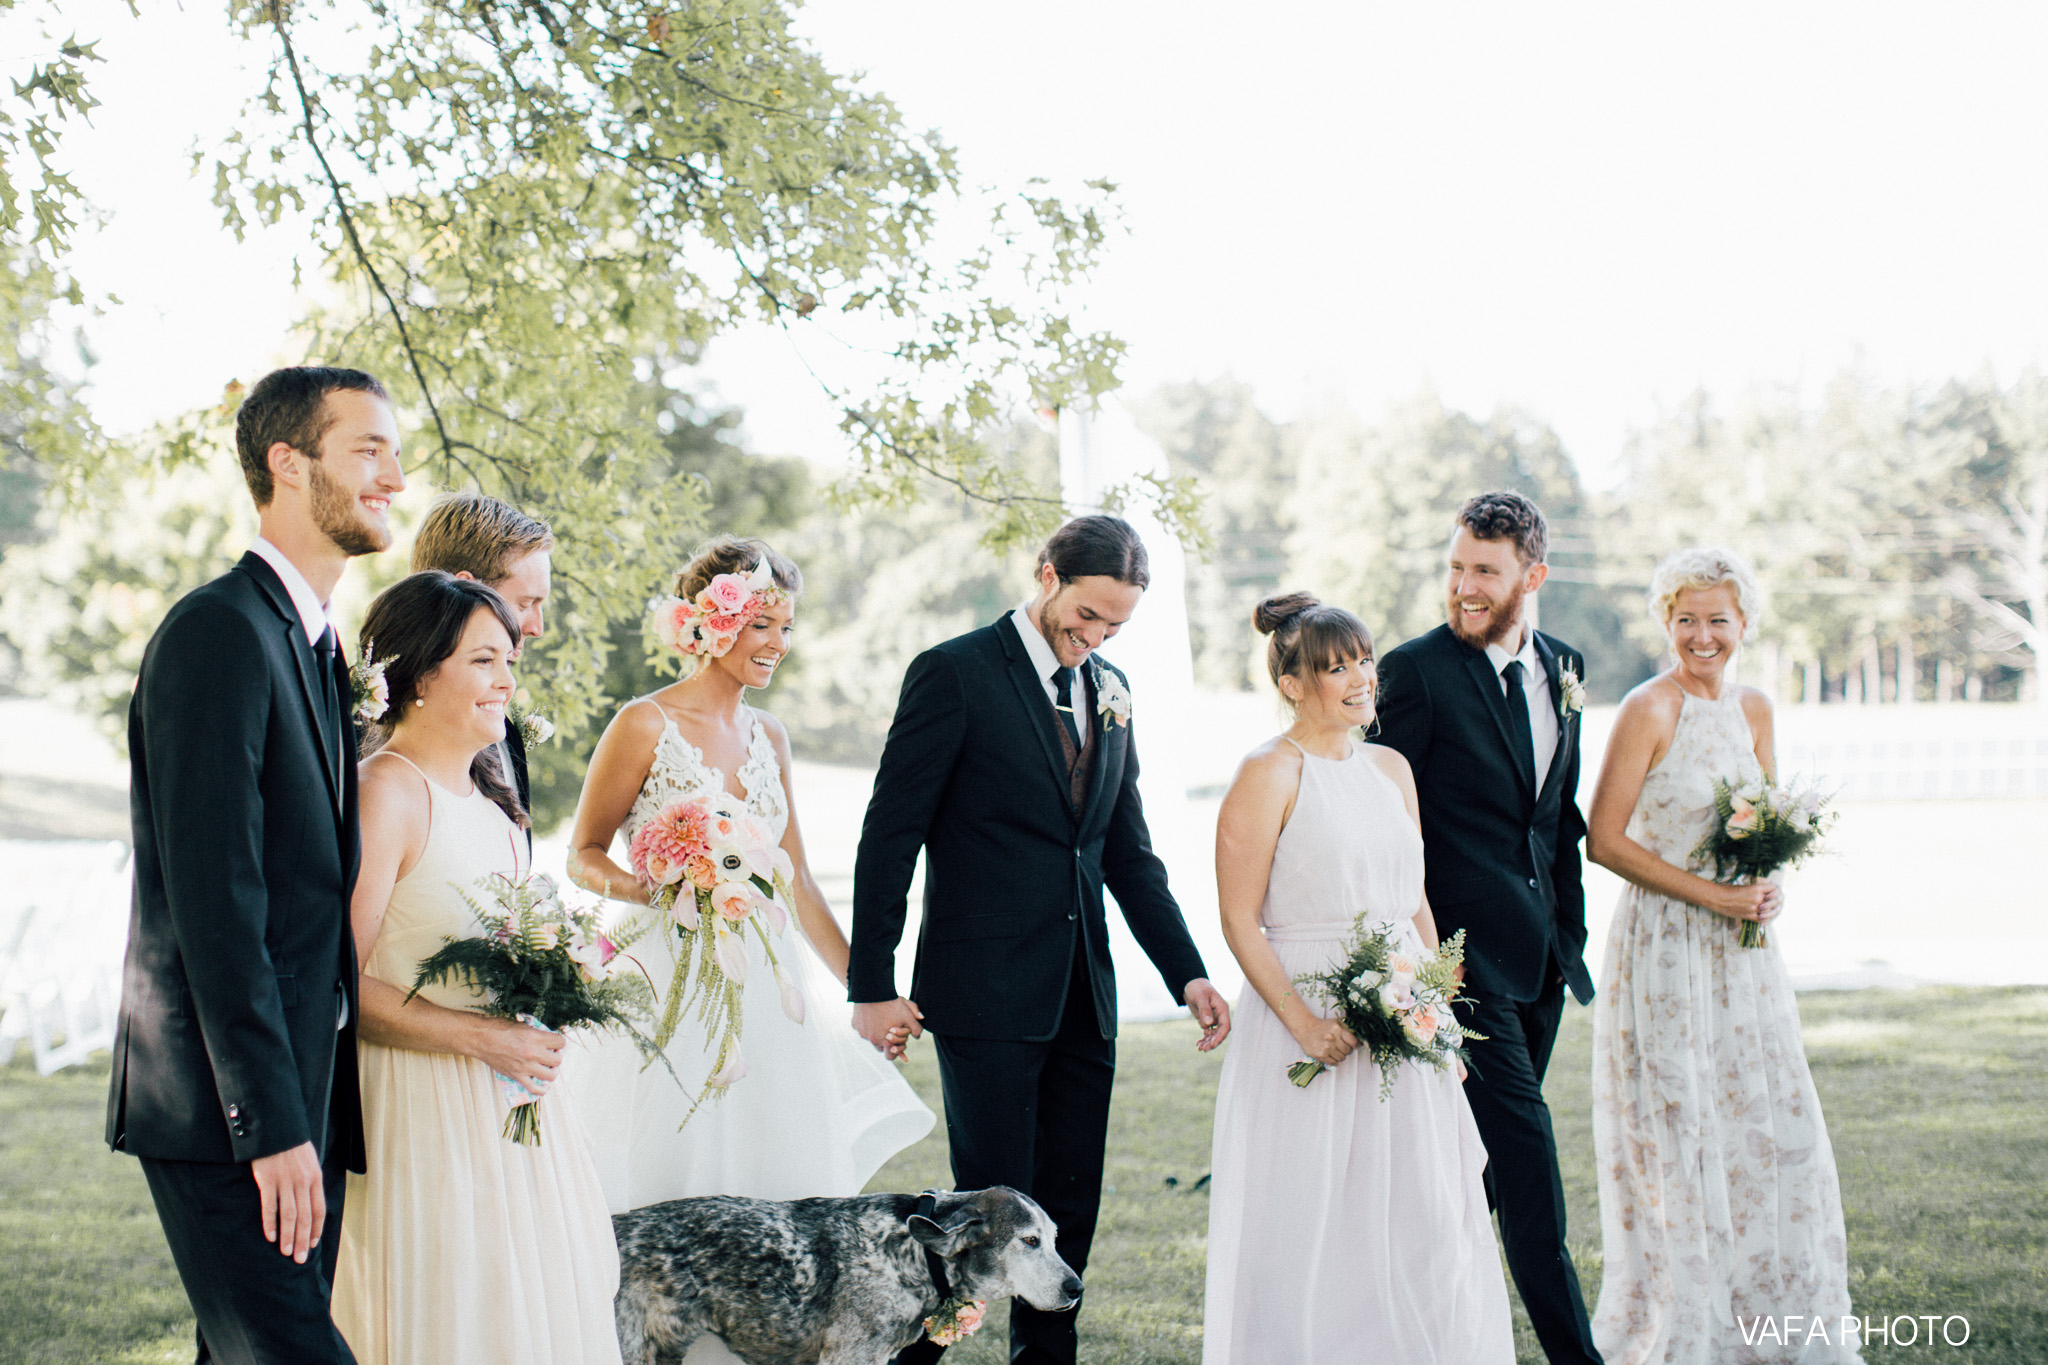 The-Felt-Estate-Wedding-Kailie-David-Vafa-Photo-519.jpg